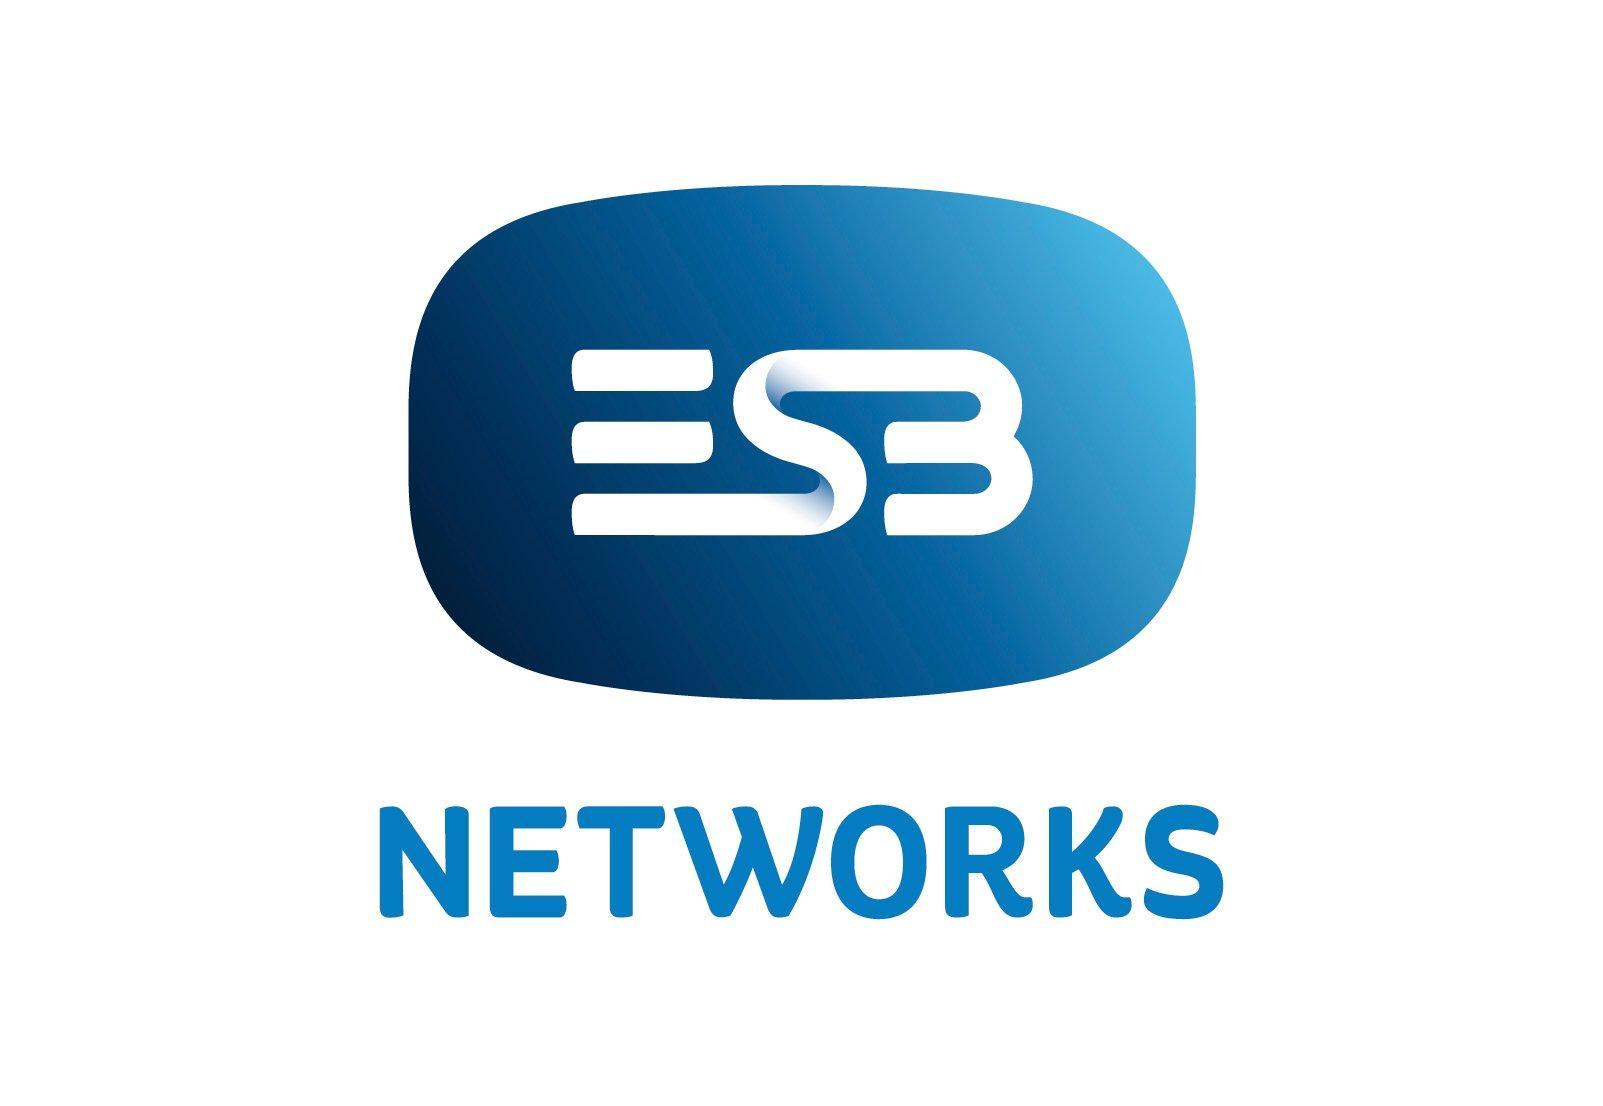 Logo van ESB E-card laadpas